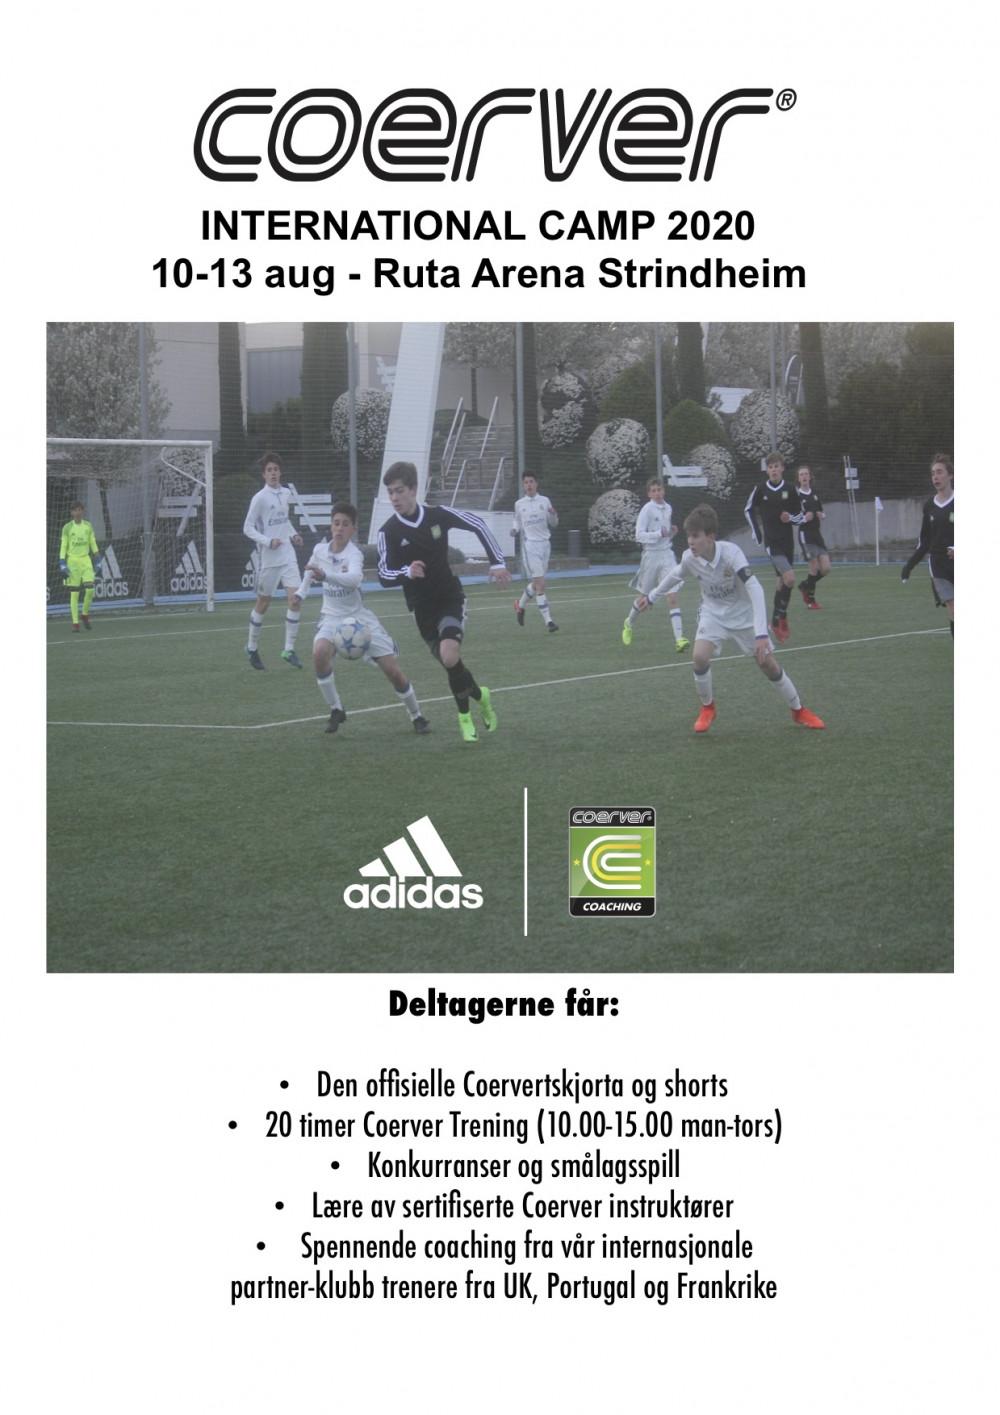 Coerver International Camp - Trondheim 2020 (UKE 33)